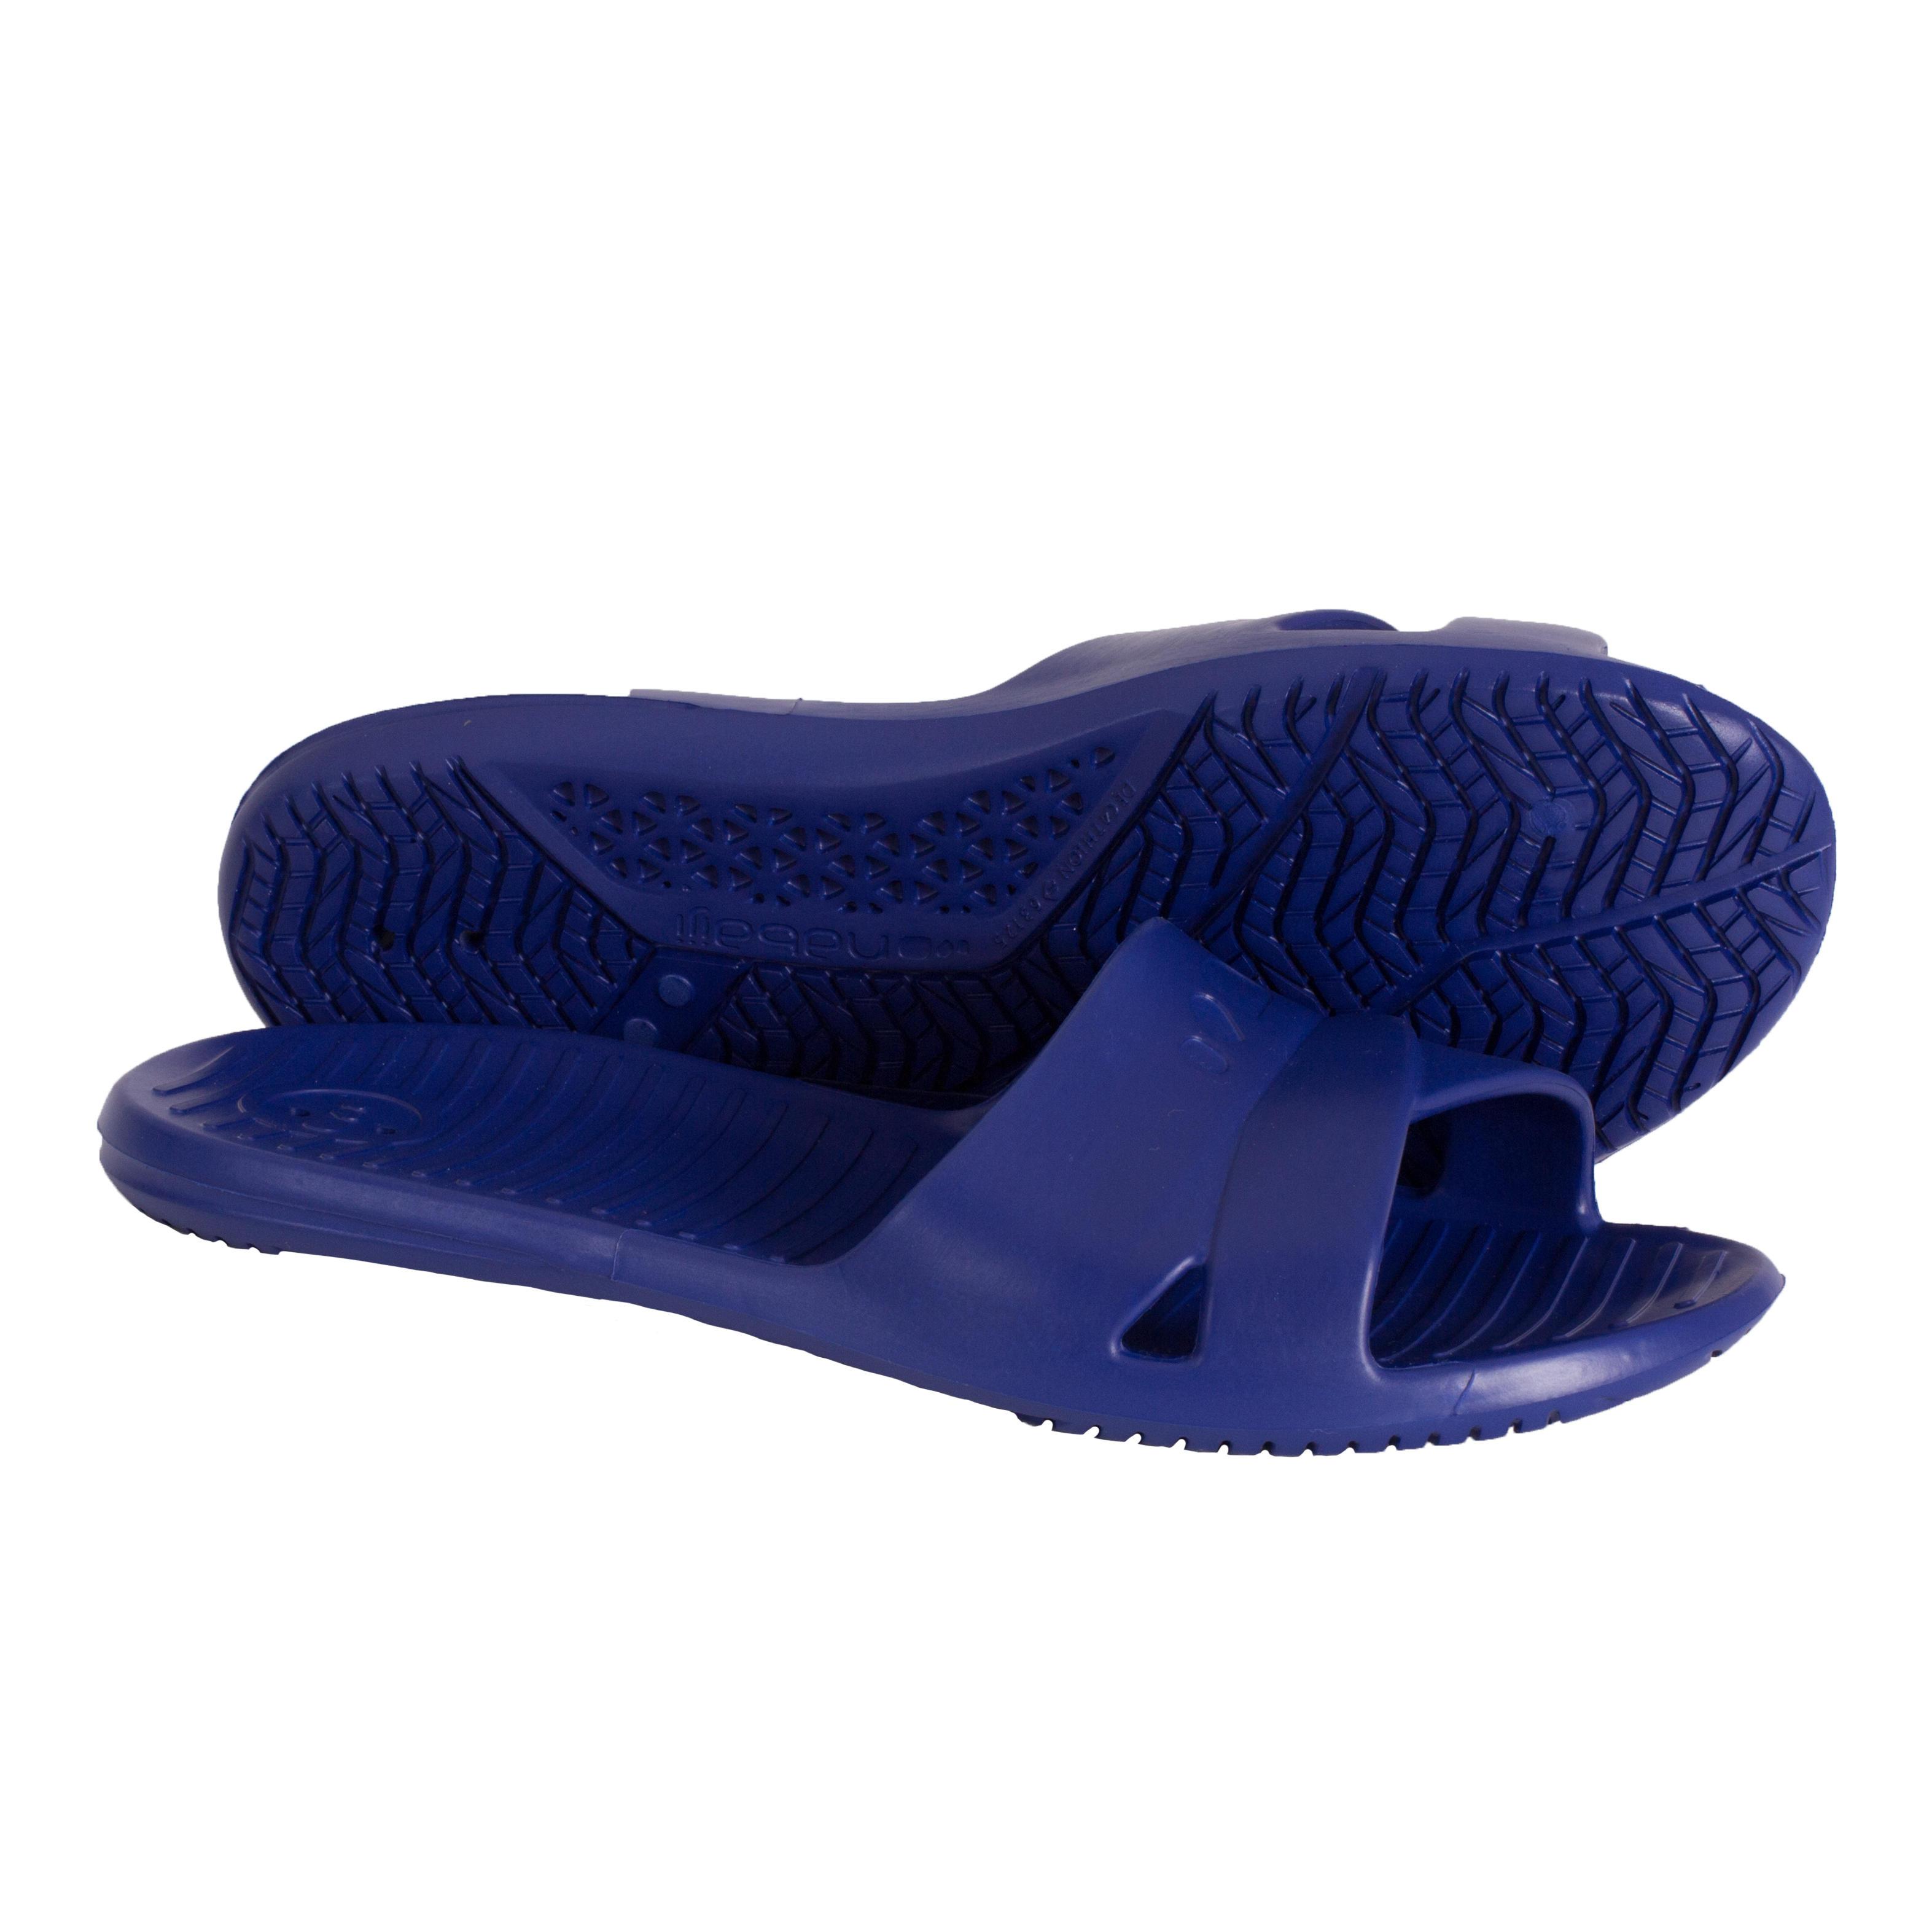 Nabaiji Badslippers voor dames donkerblauw